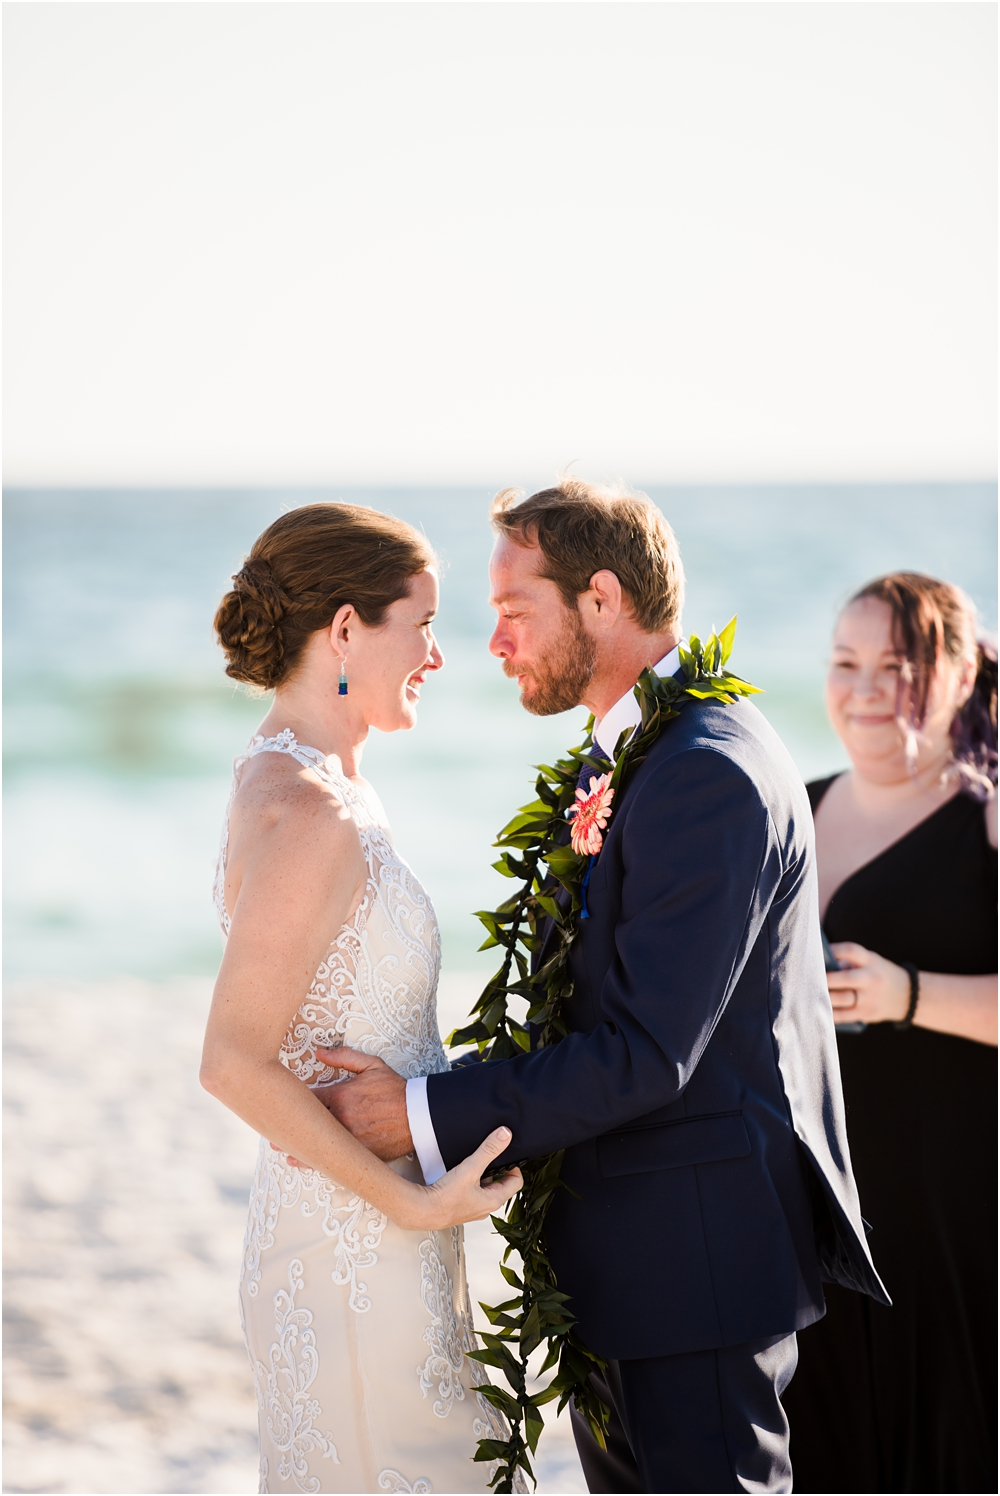 ledman-wedding-kiersten-stevenson-photography-30a-panama-city-beach-dothan-tallahassee-(248-of-763).JPG